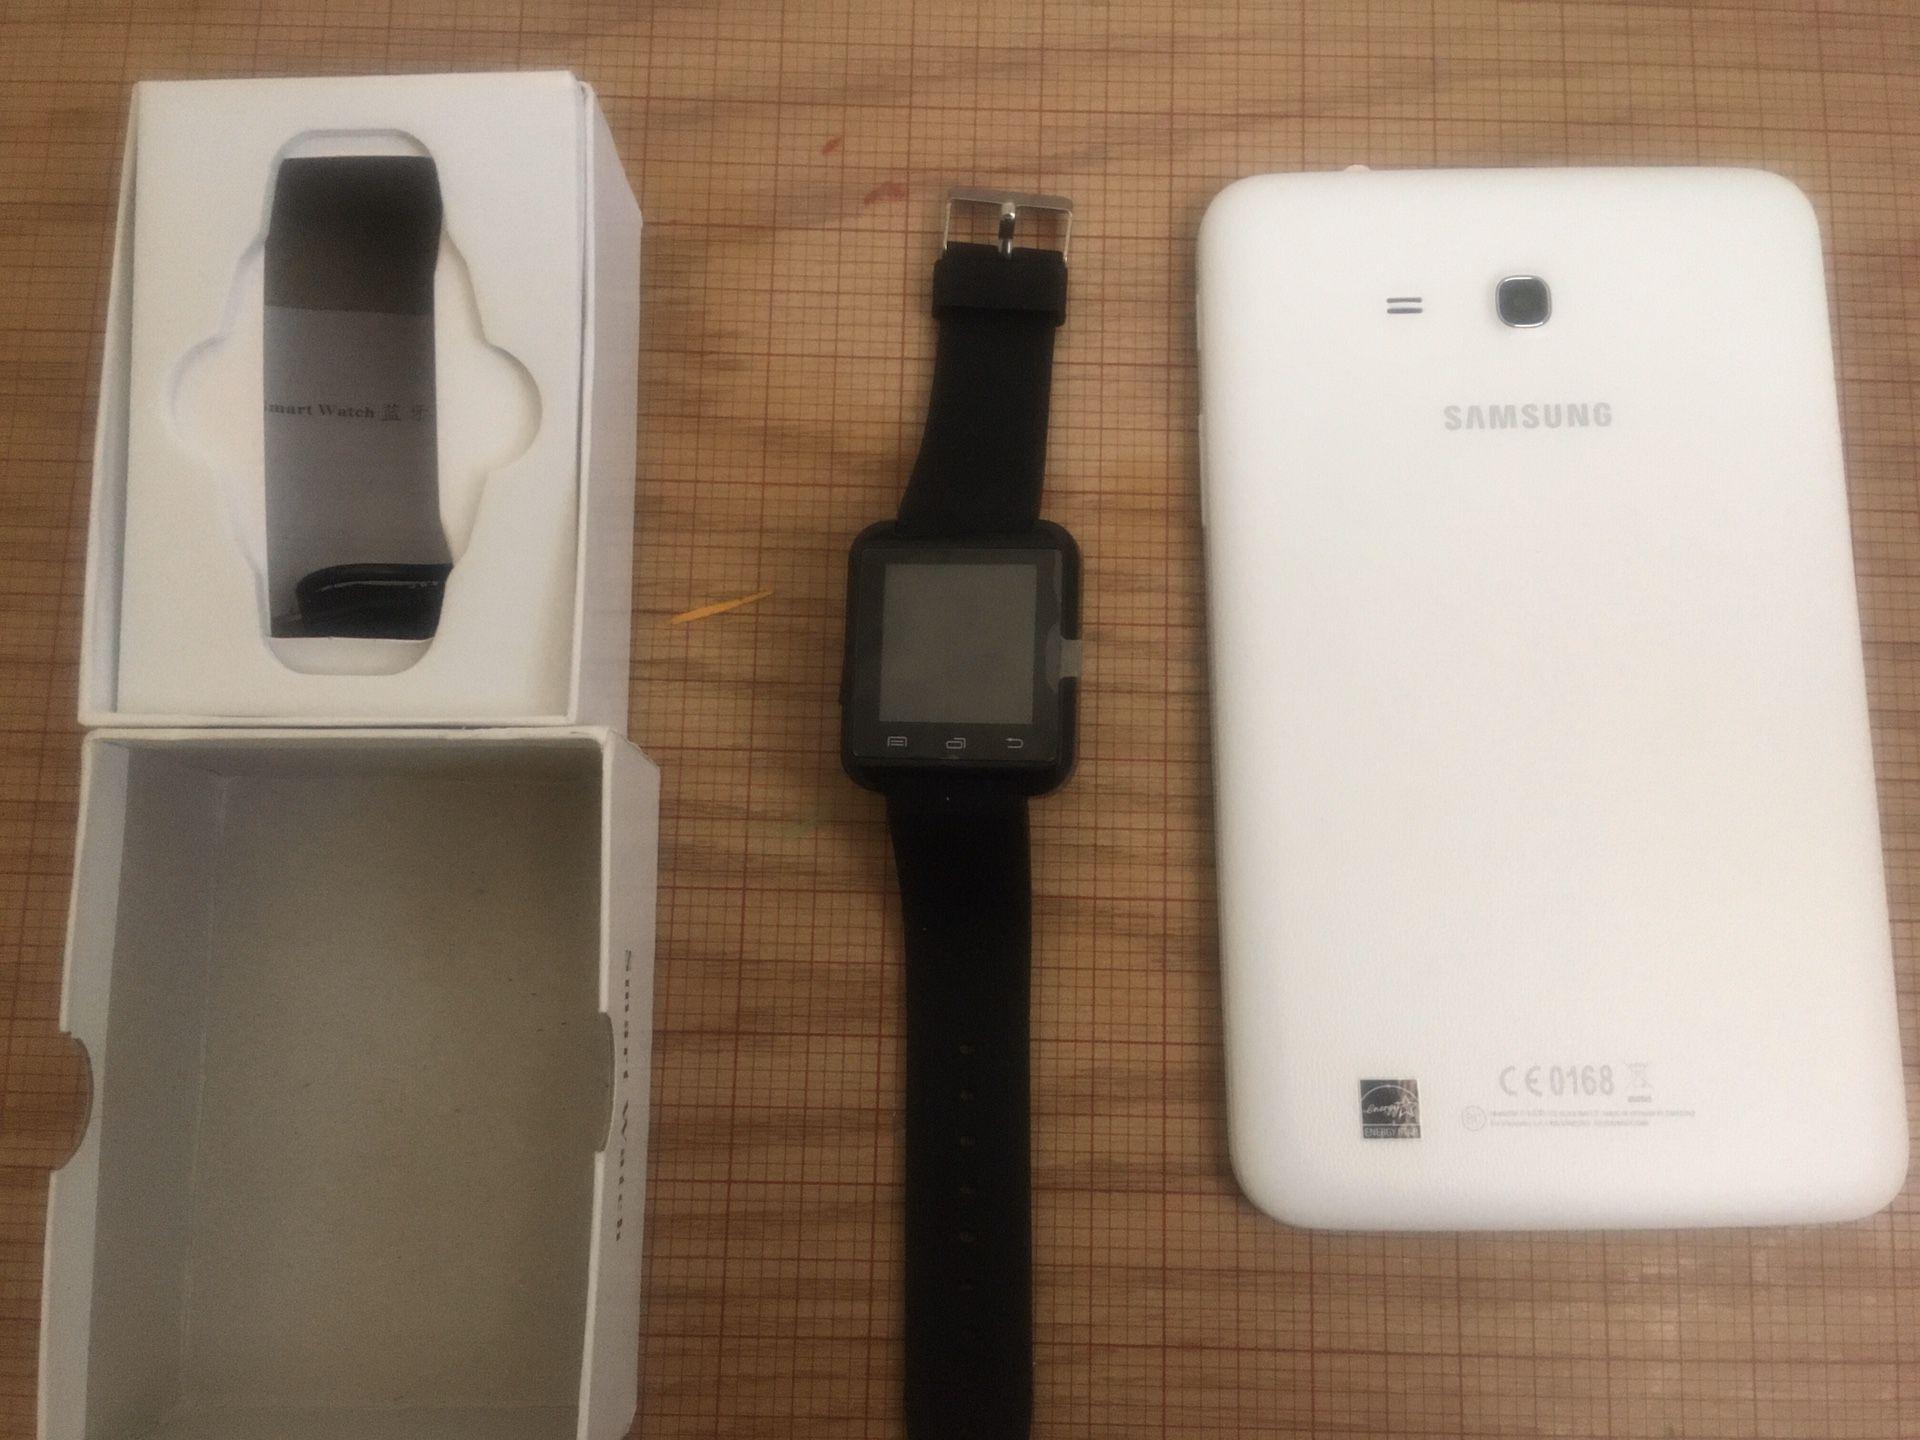 Smart Watch And Samsung Tab E